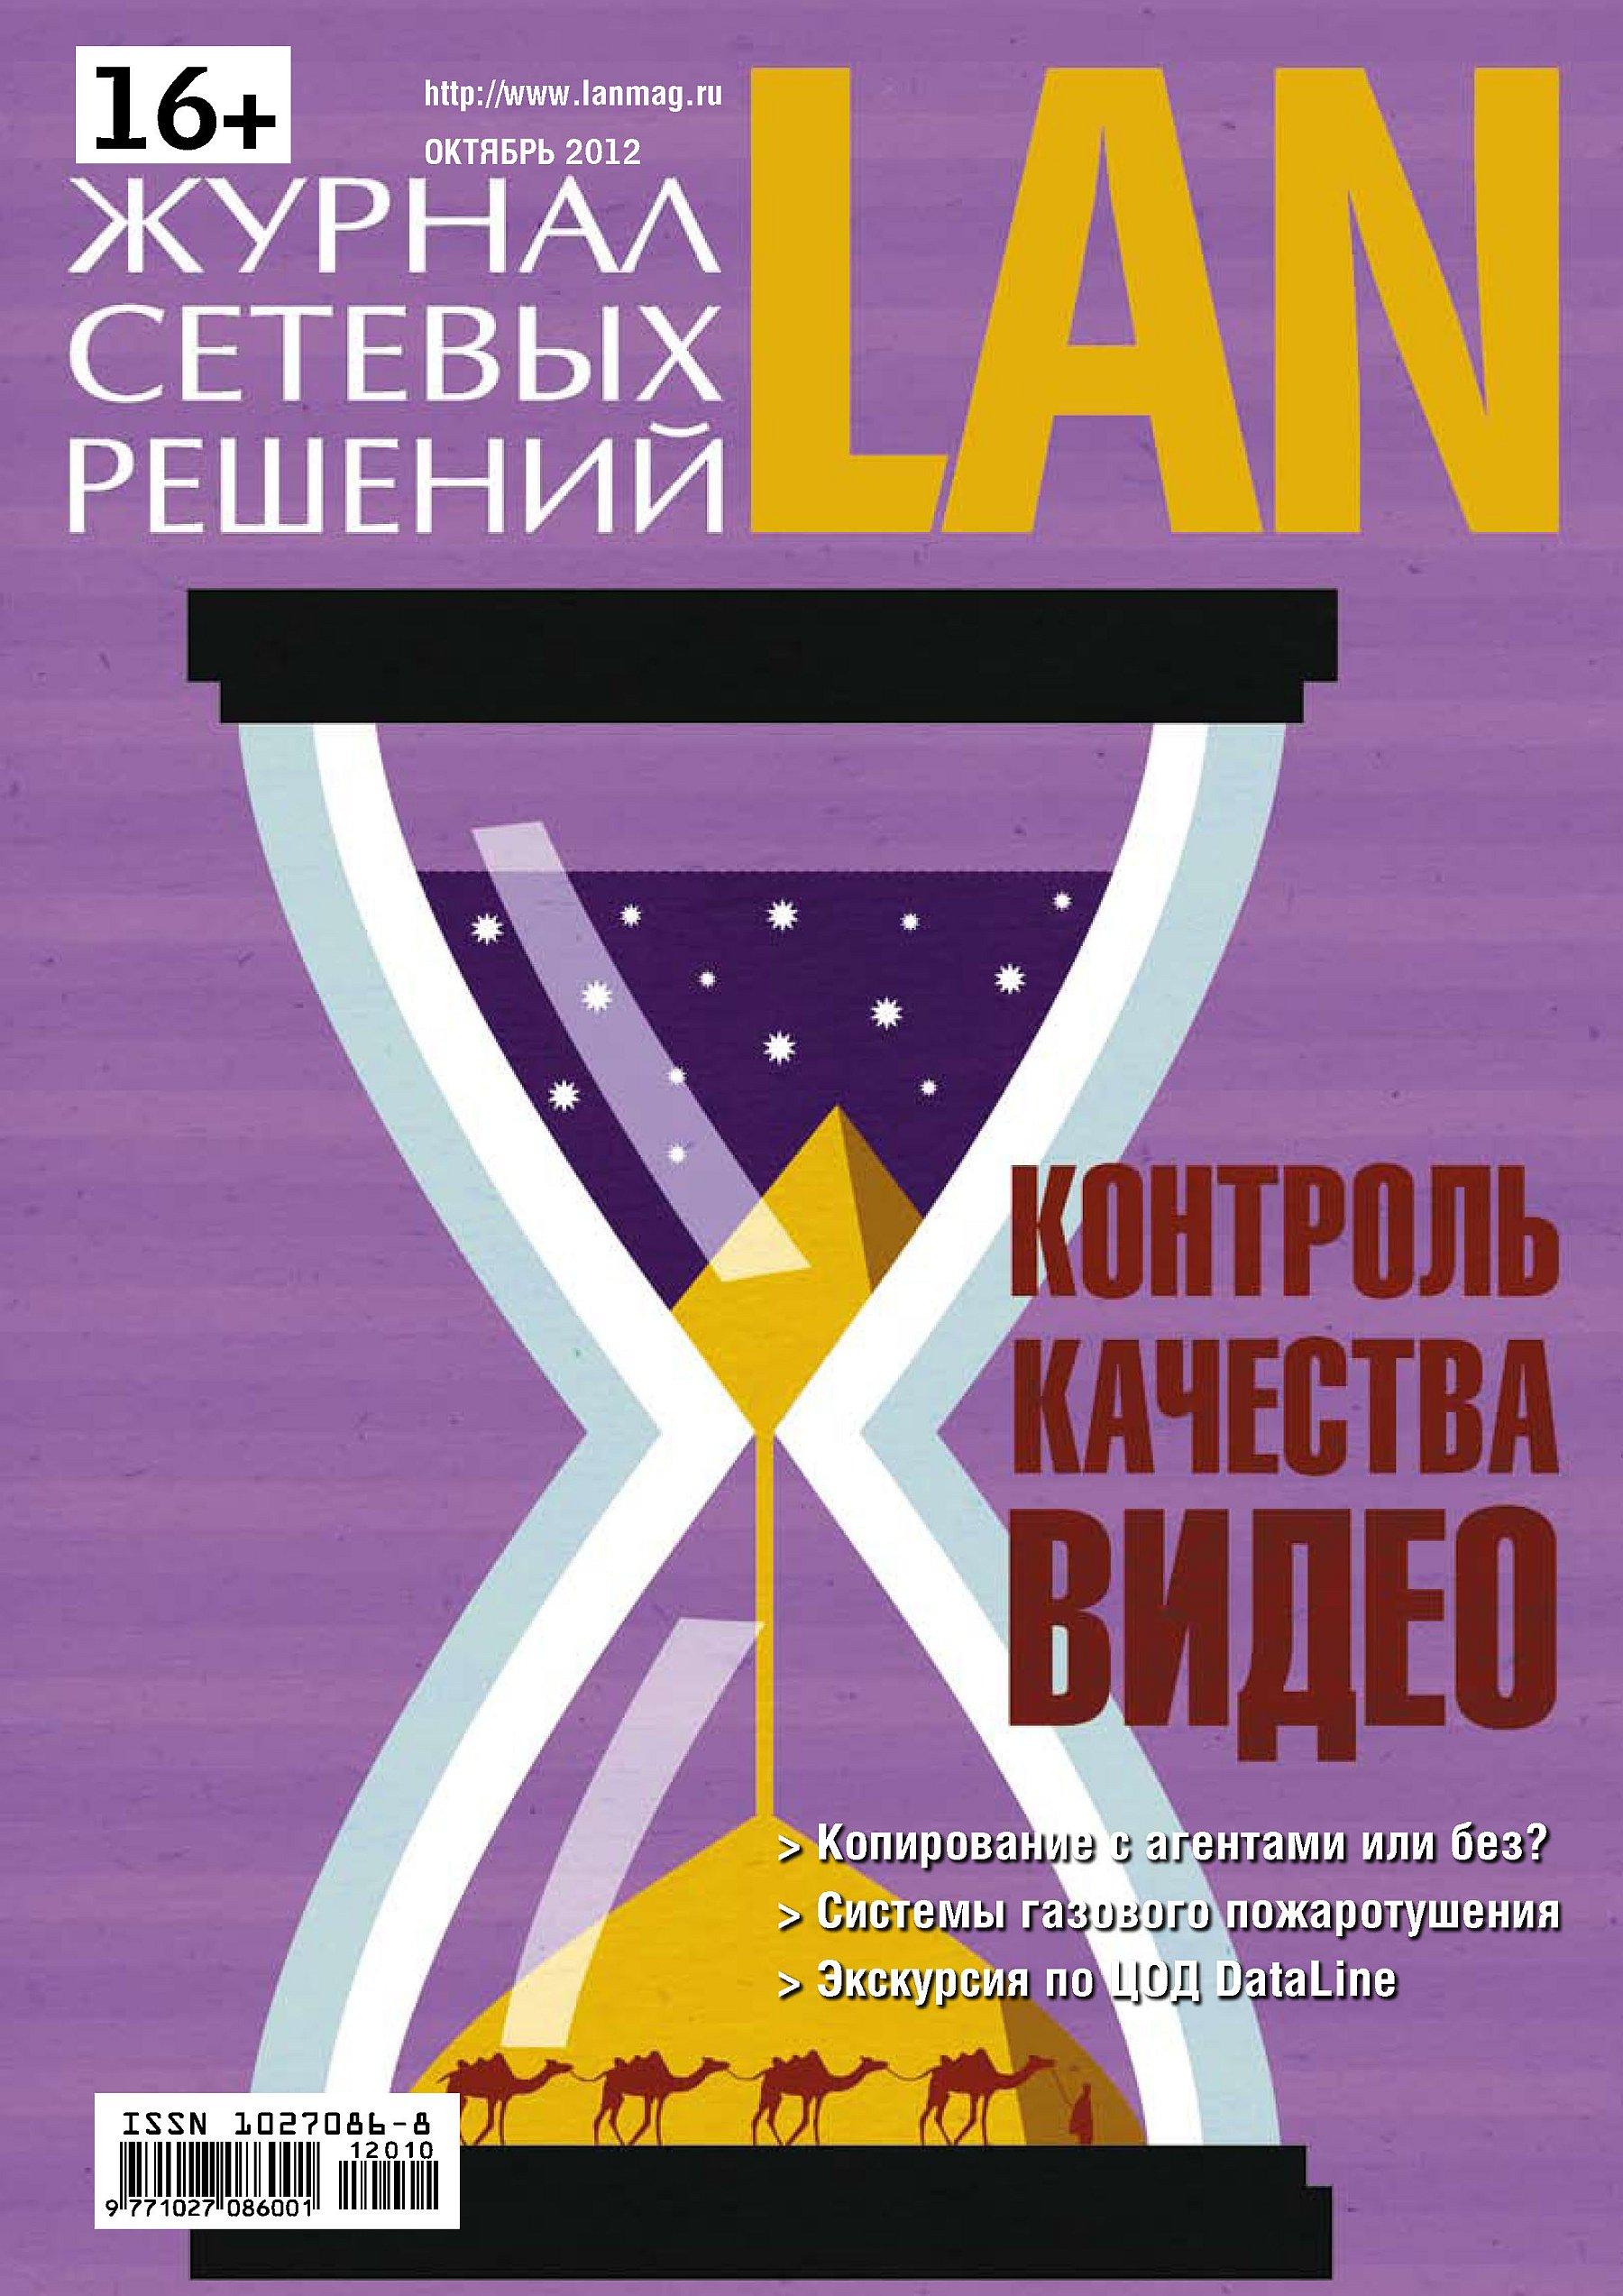 Журнал сетевых решений / LAN № 10/2012